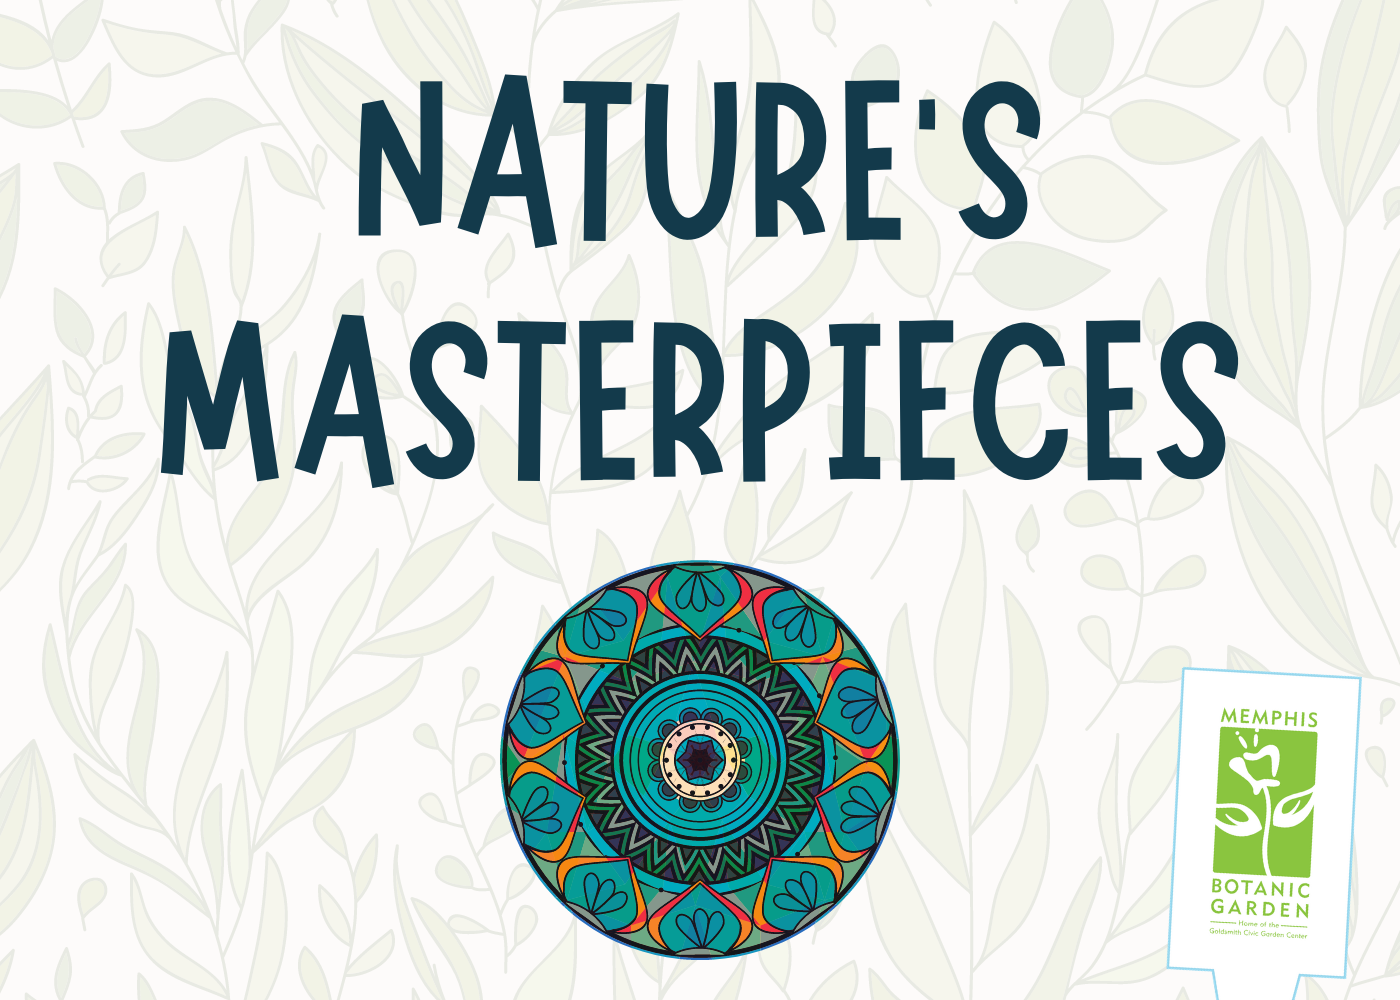 Nature's Masterpieces